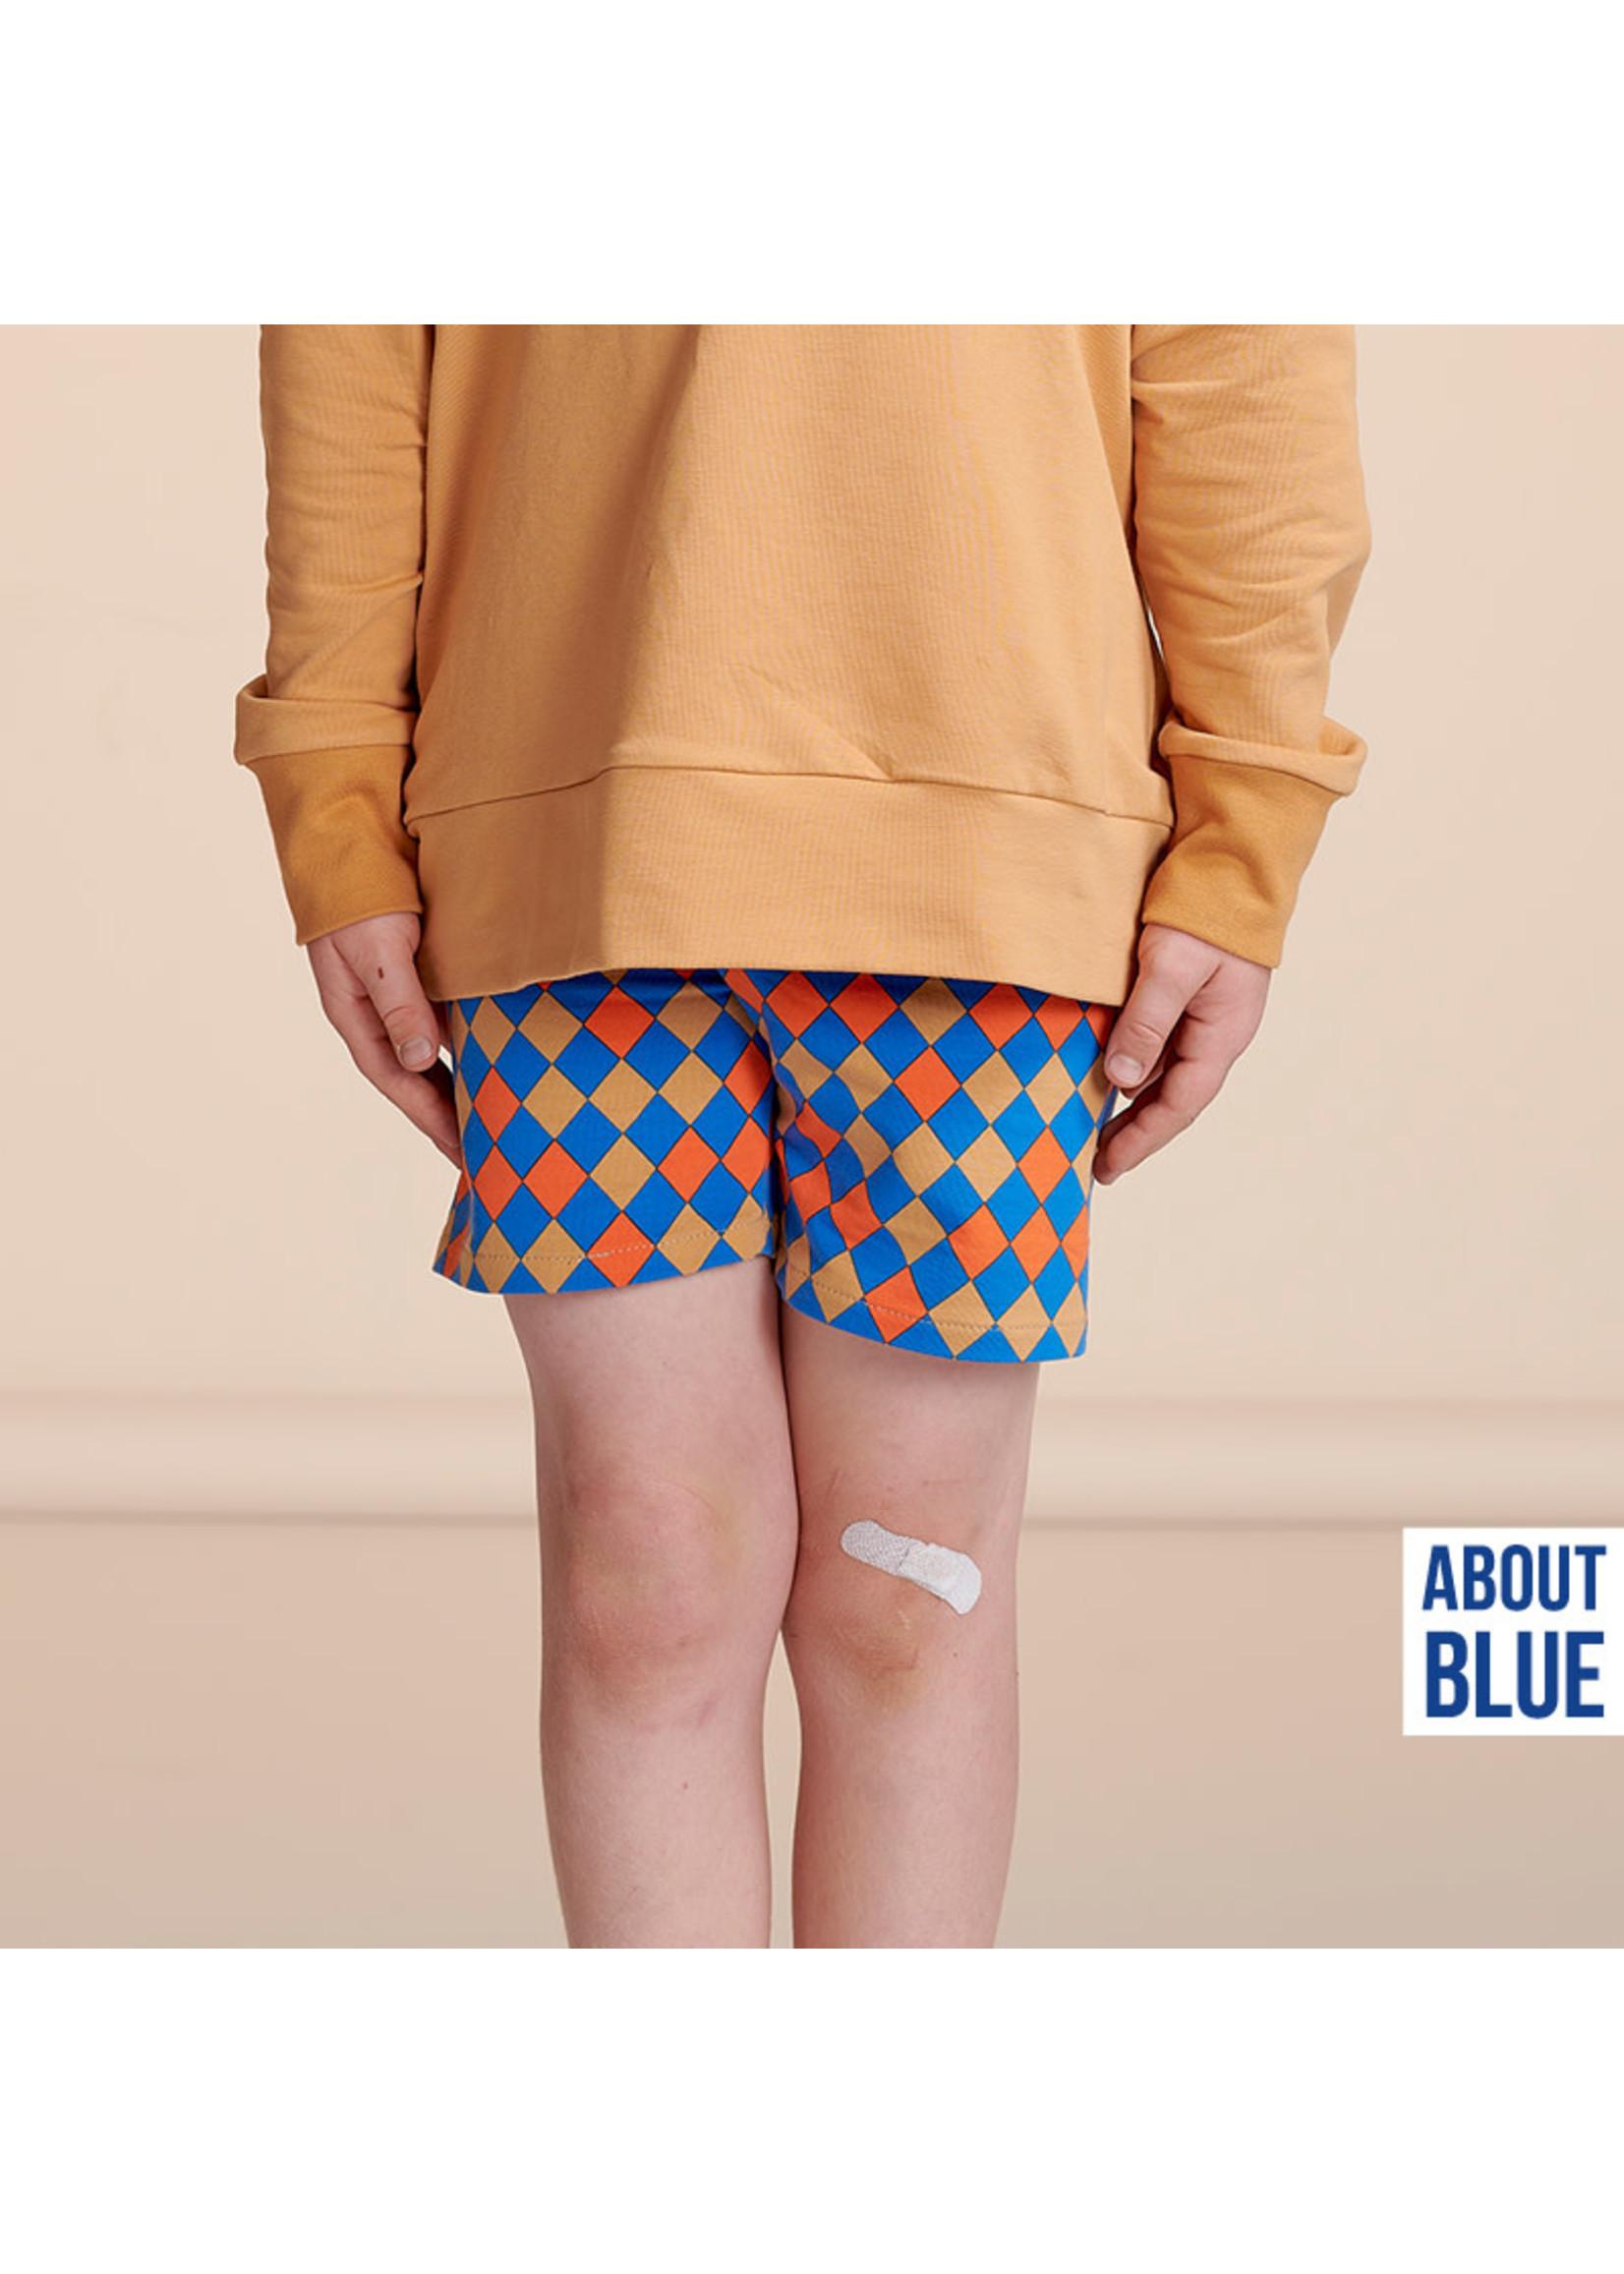 About Blue Fabrics Uni 20 - Indian Tan Ribbing